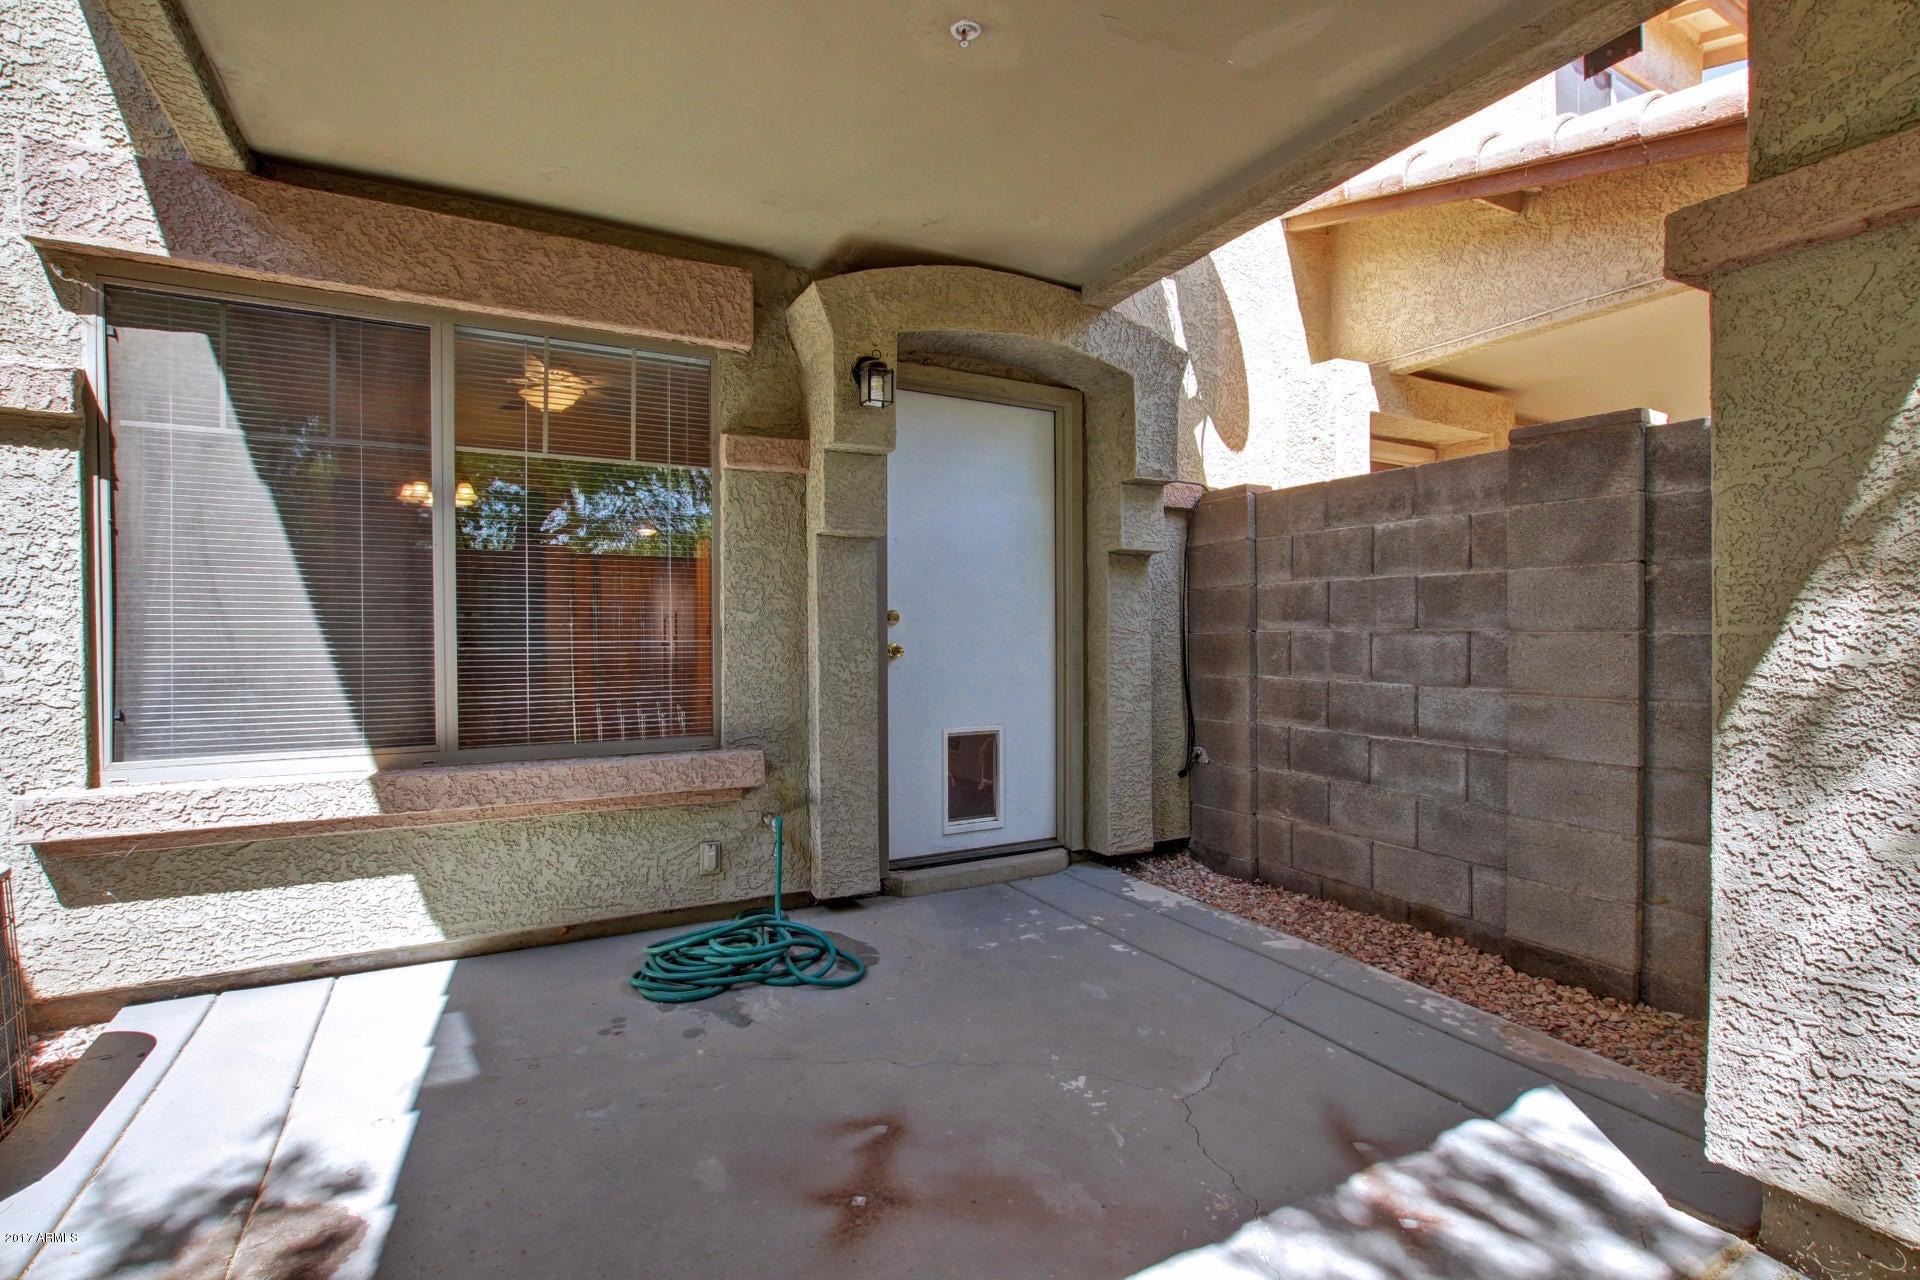 MLS 5595304 525 N MILLER Road Unit 165, Scottsdale, AZ 85257 Scottsdale AZ Private Pool